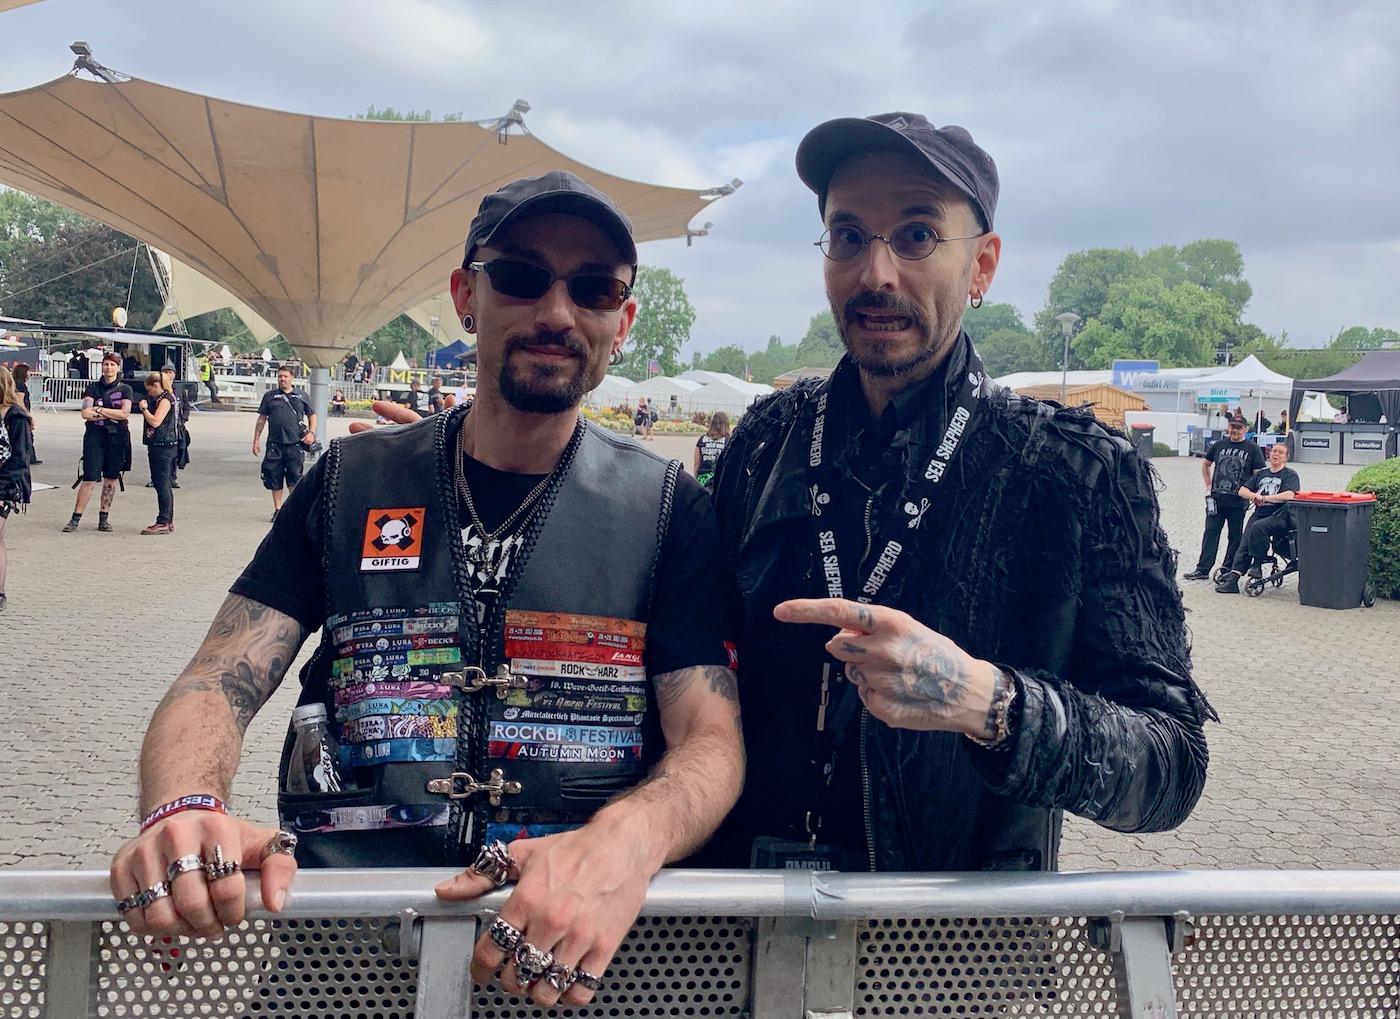 mark_benecke_amphi_festival_koeln_2019 - 133.jpg